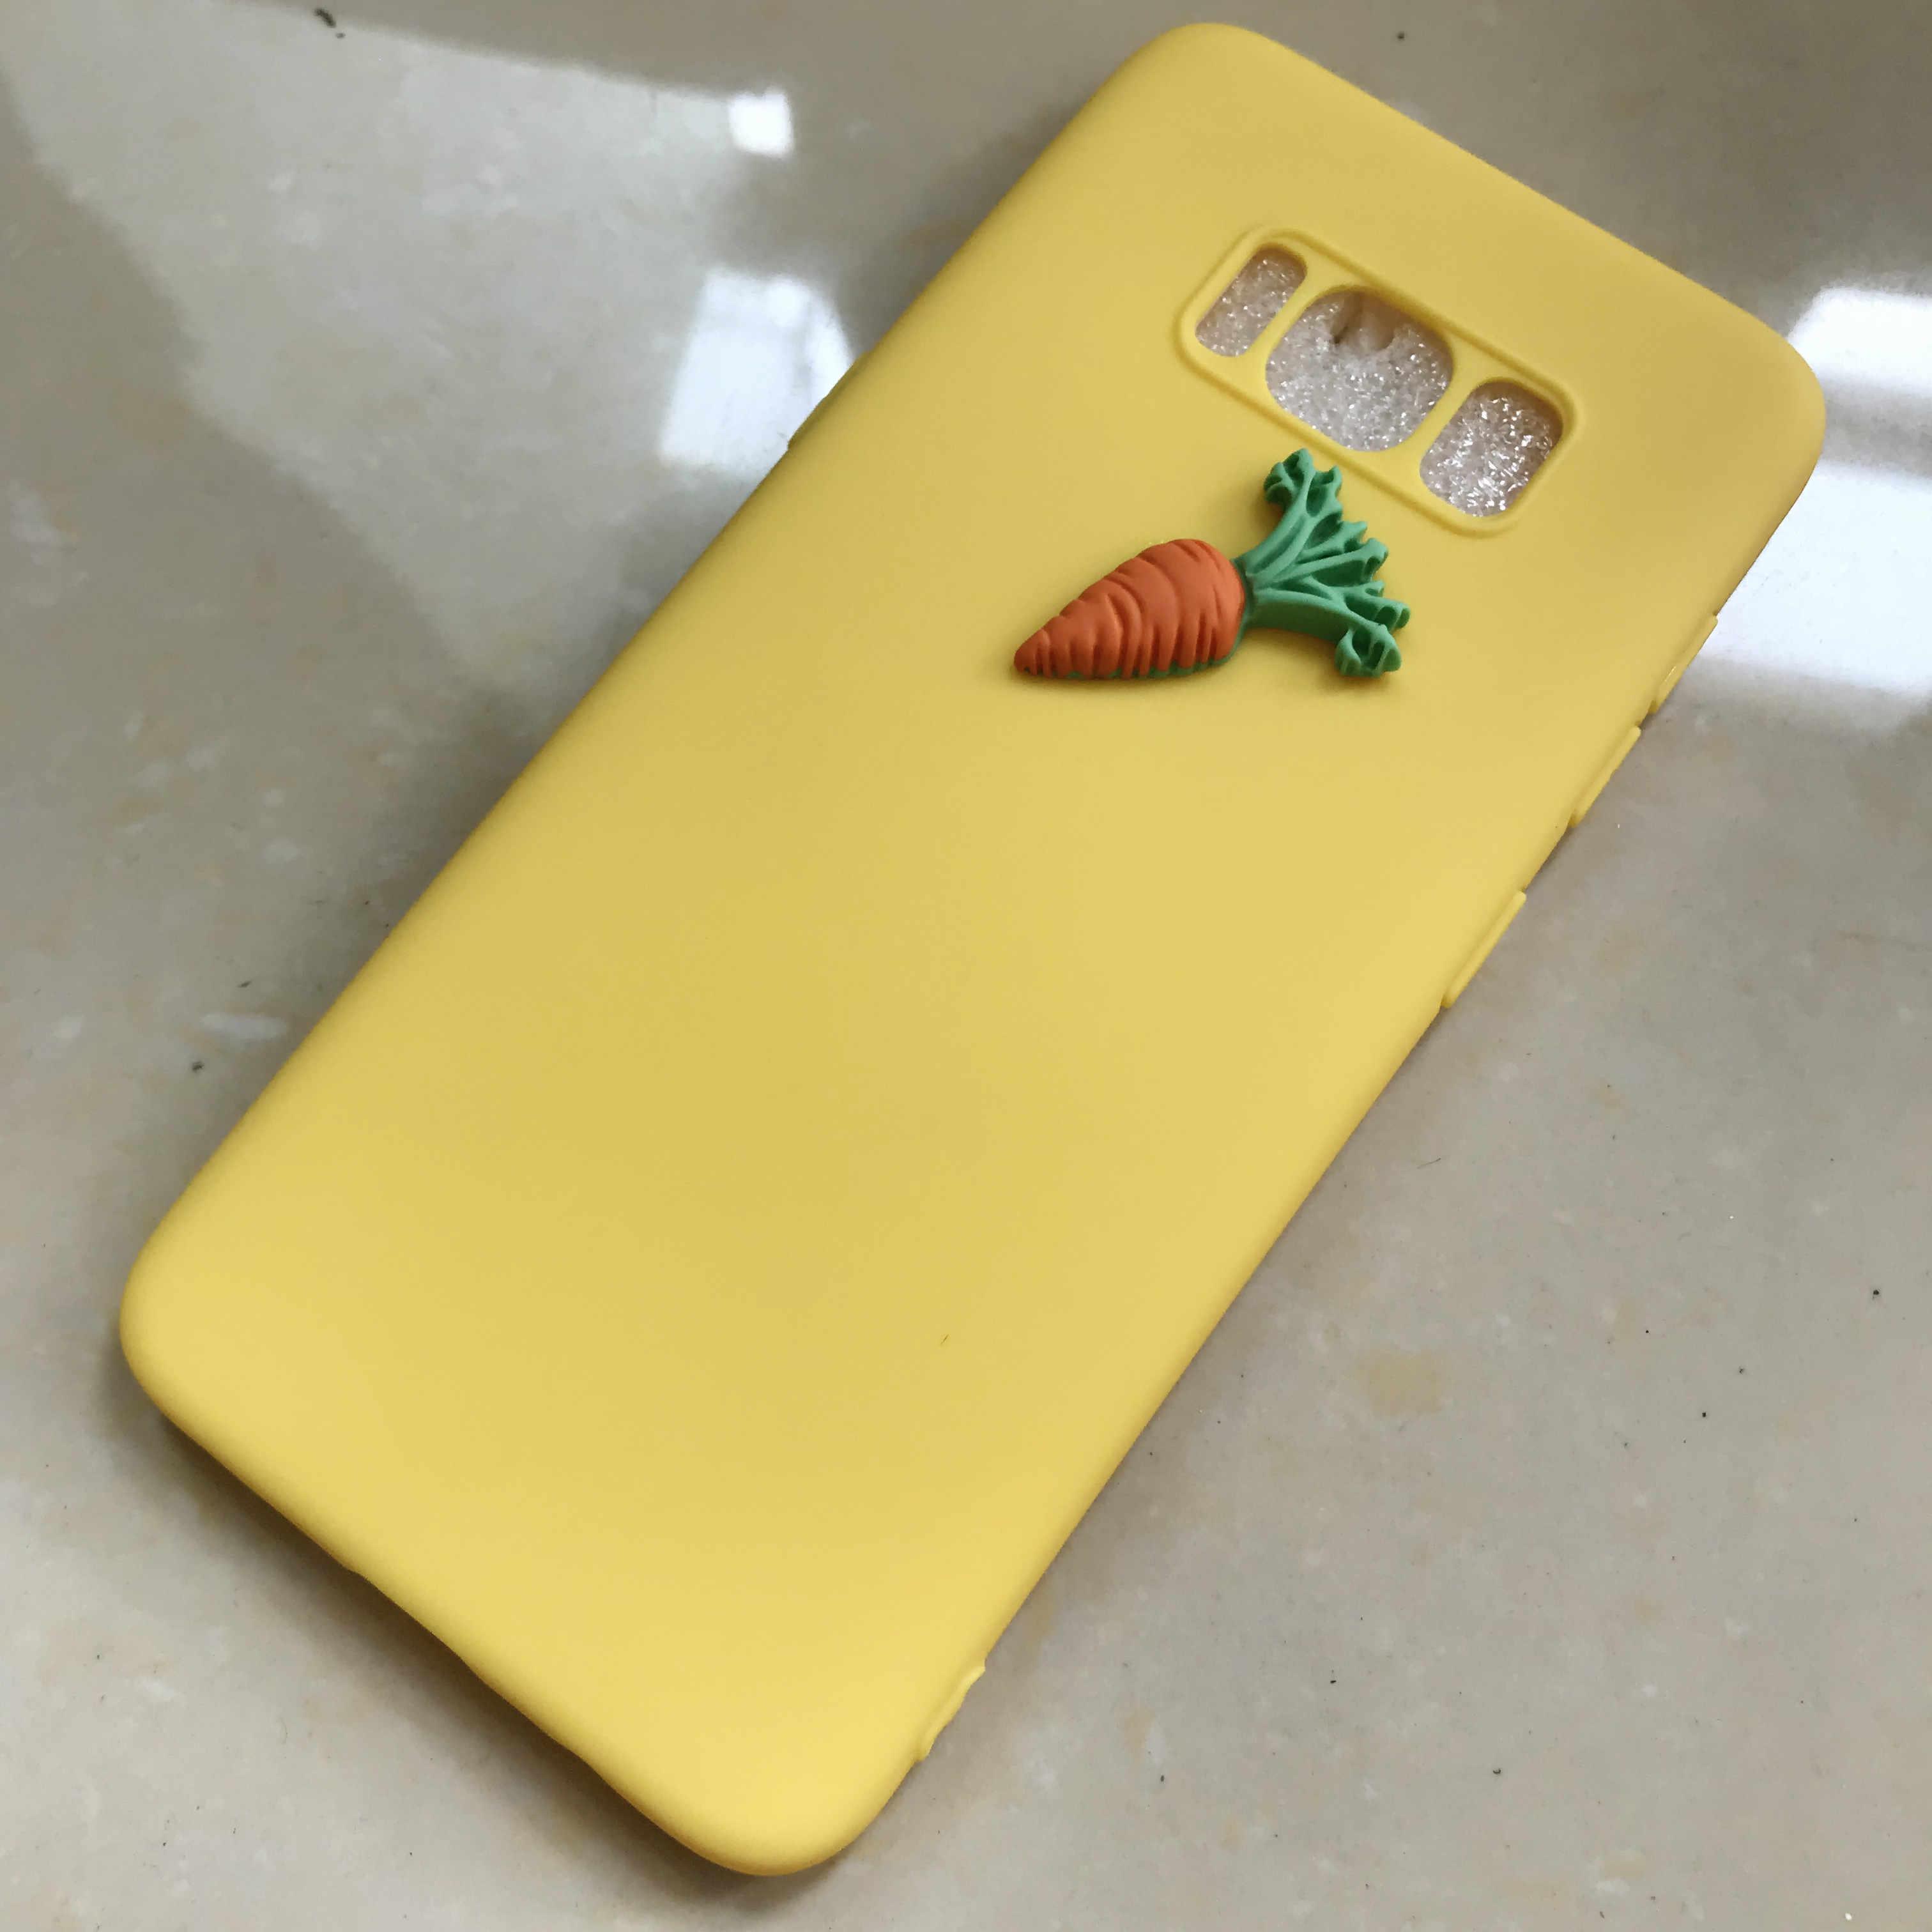 3D fruta de plátano de uva caja de dulces para Xiaomi Redmi 7 Y3 Nota 7 6 5 Pro Redmi 5 5a 6 6a K20 5 plus Note4x S2 suave cubierta posterior